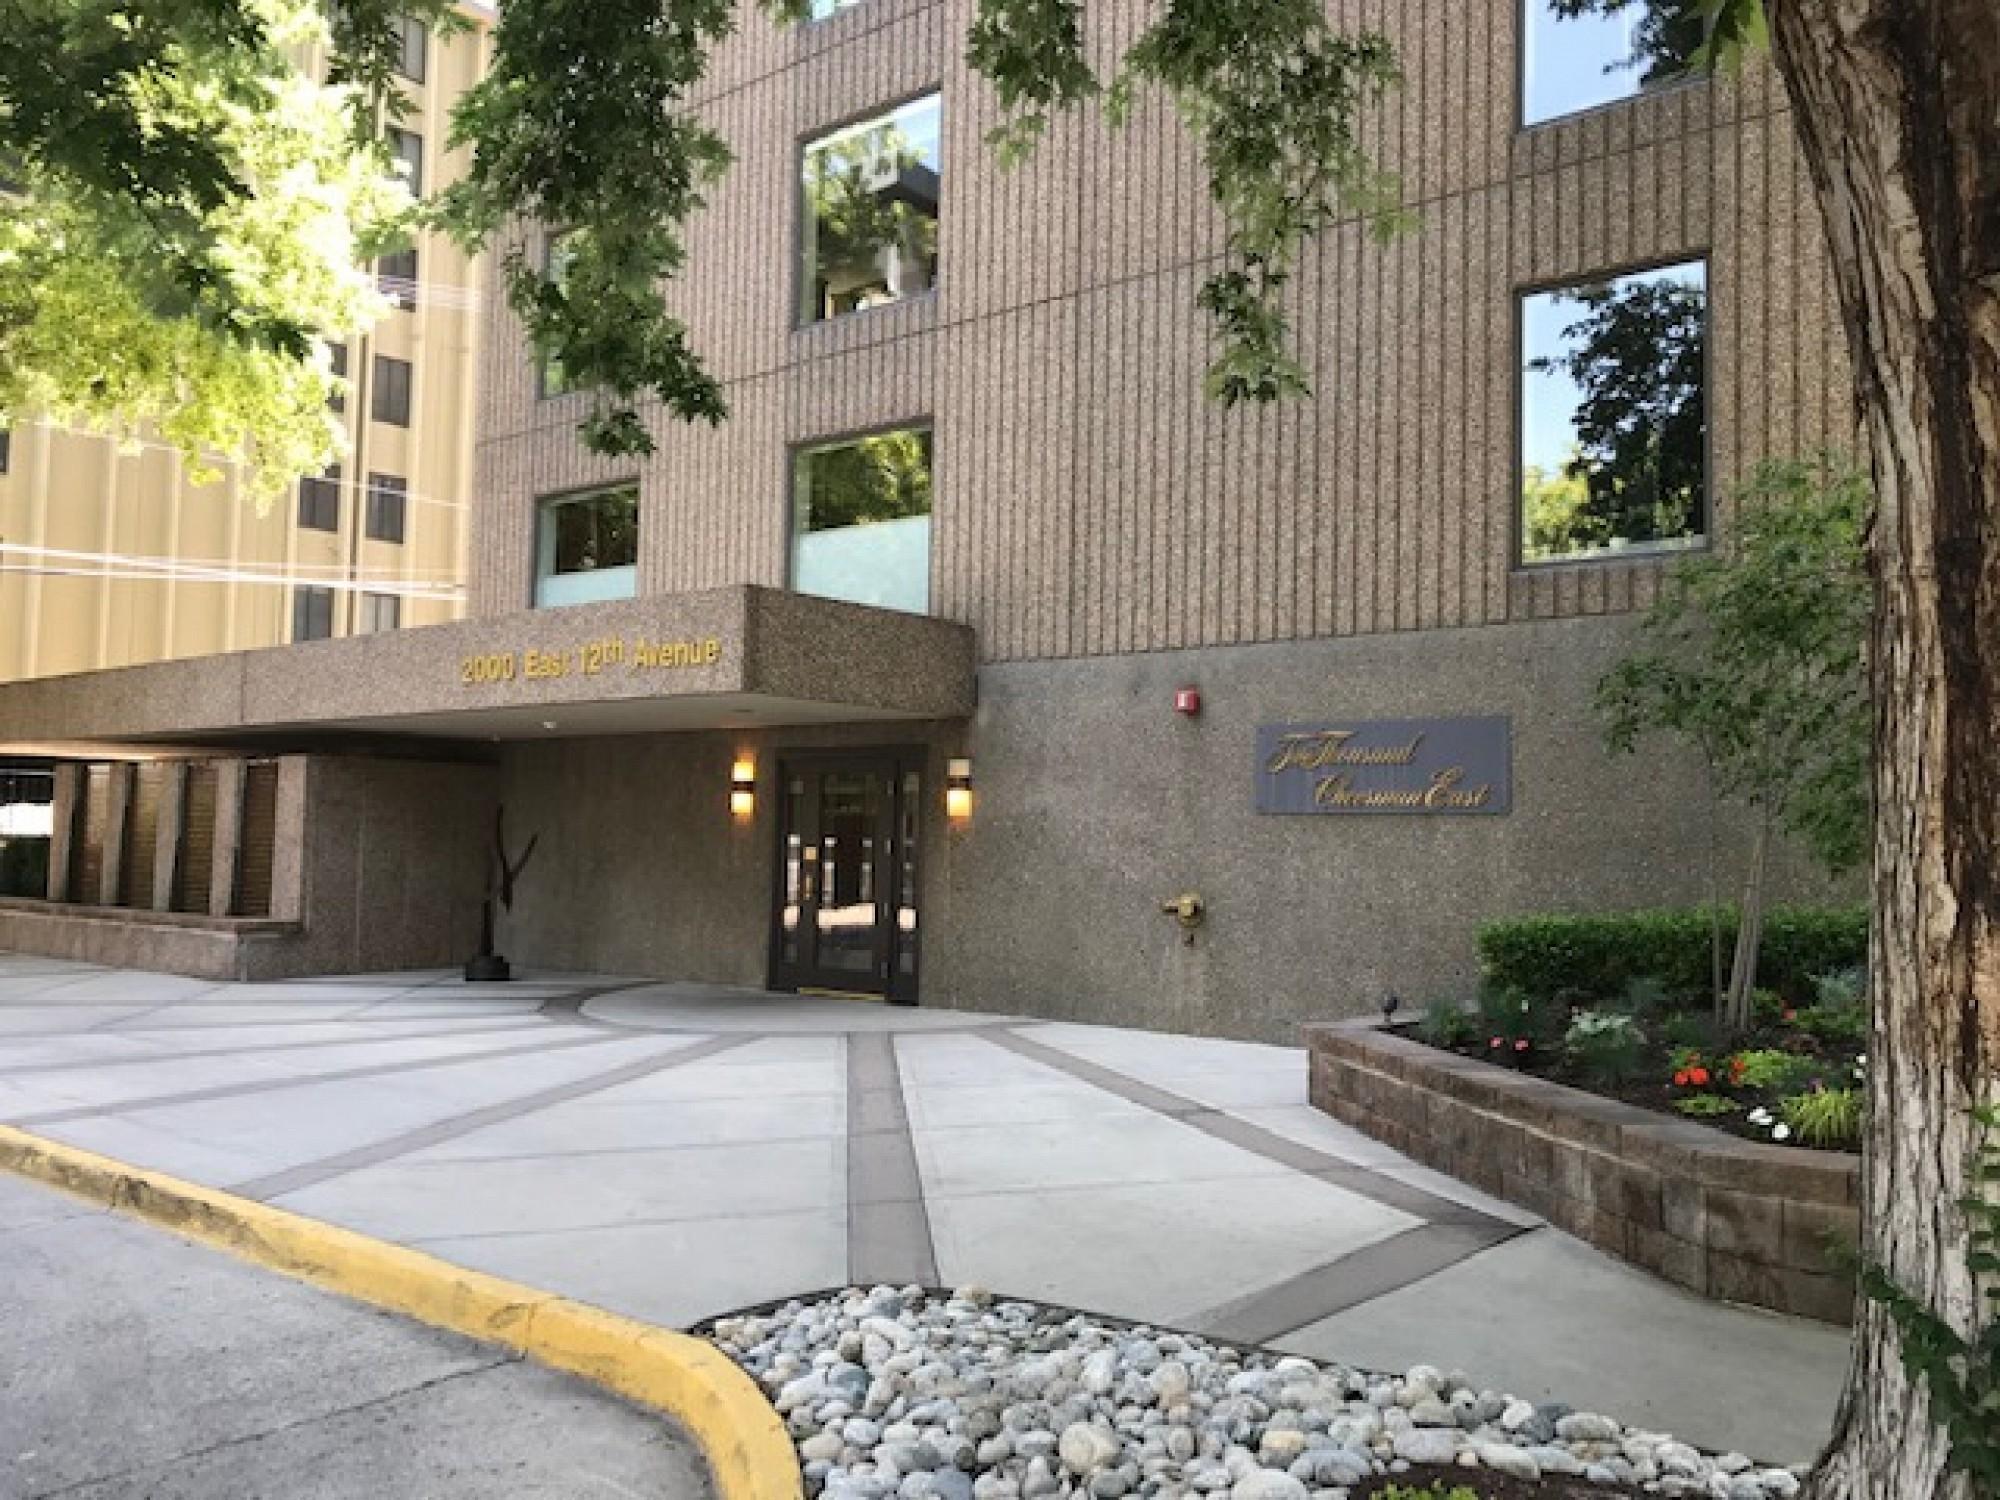 2000 E. 12th Avenue #22A, Denver, CO 80206